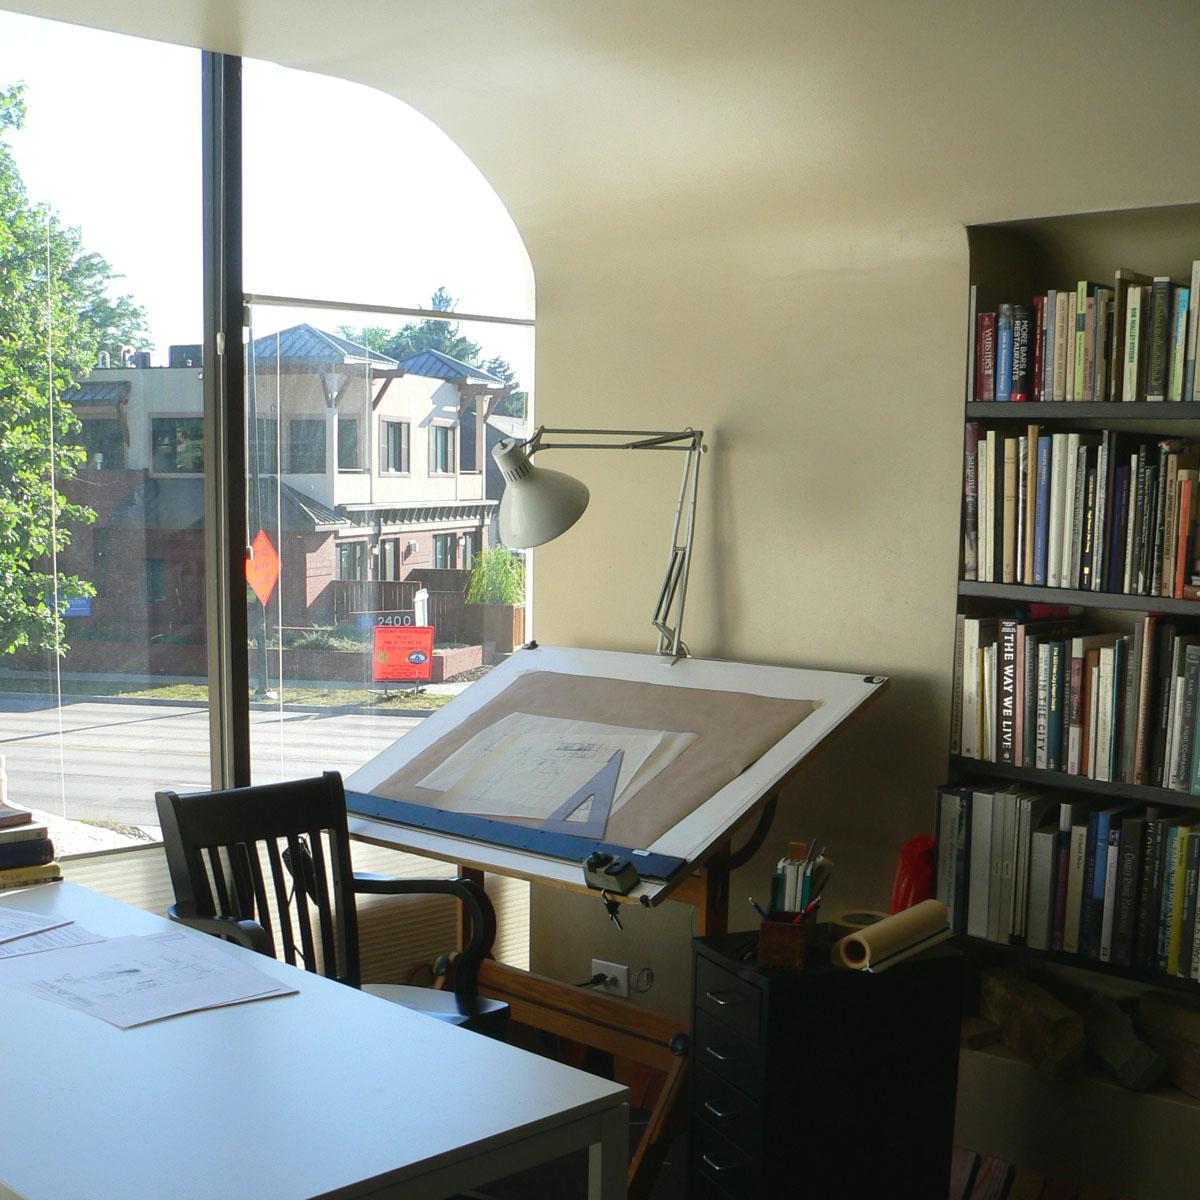 Drafting Table Light Fixtures Lighting Designs